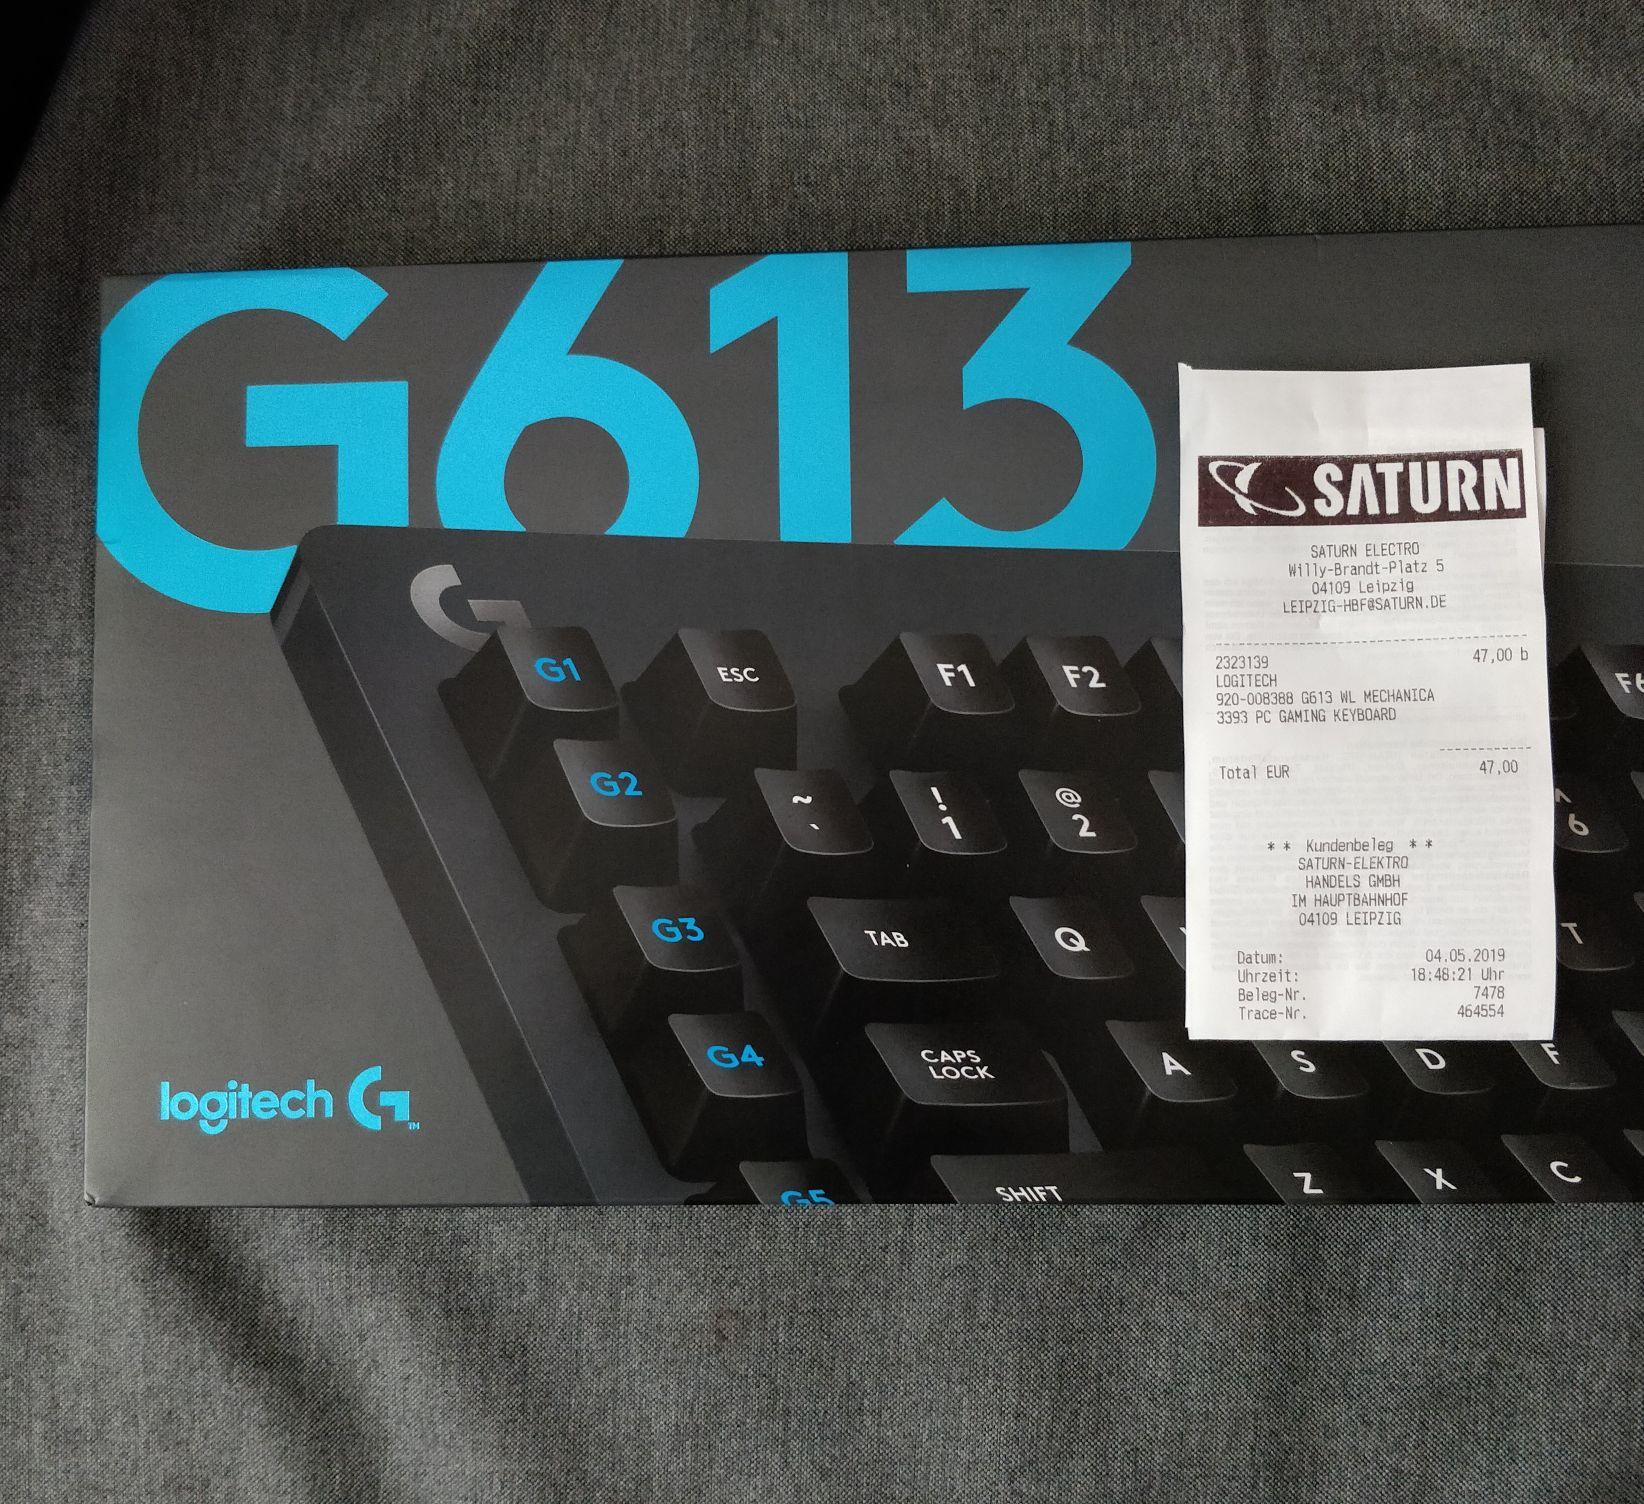 [Lokal?] [Saturn Leipzig] Logitech G613 kabellose mechanische Tastatur